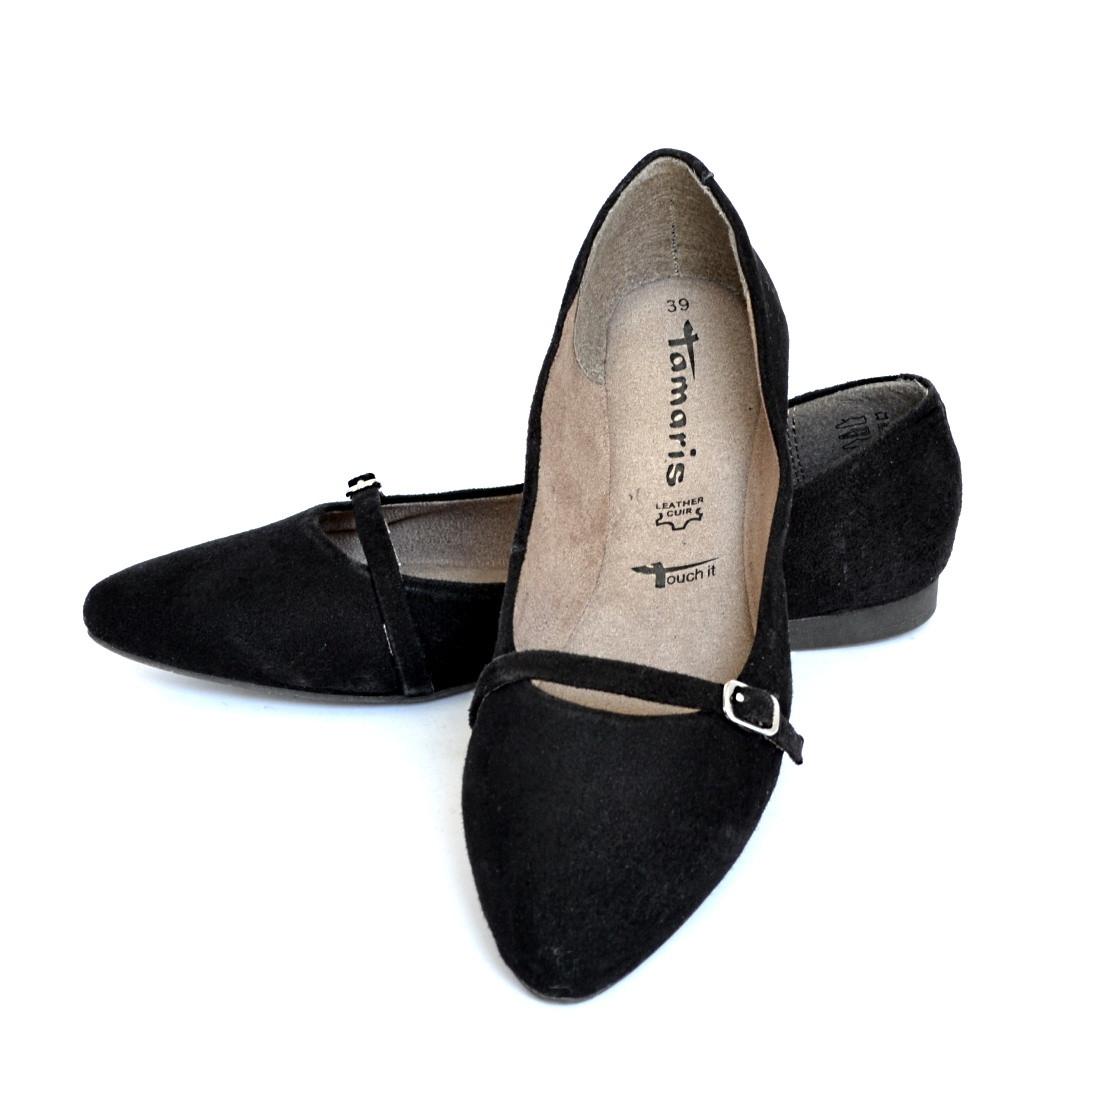 cb3e4a85f3ae5 Балетки женские черные Tamaris размер 38: продажа, цена в Мелитополе ...